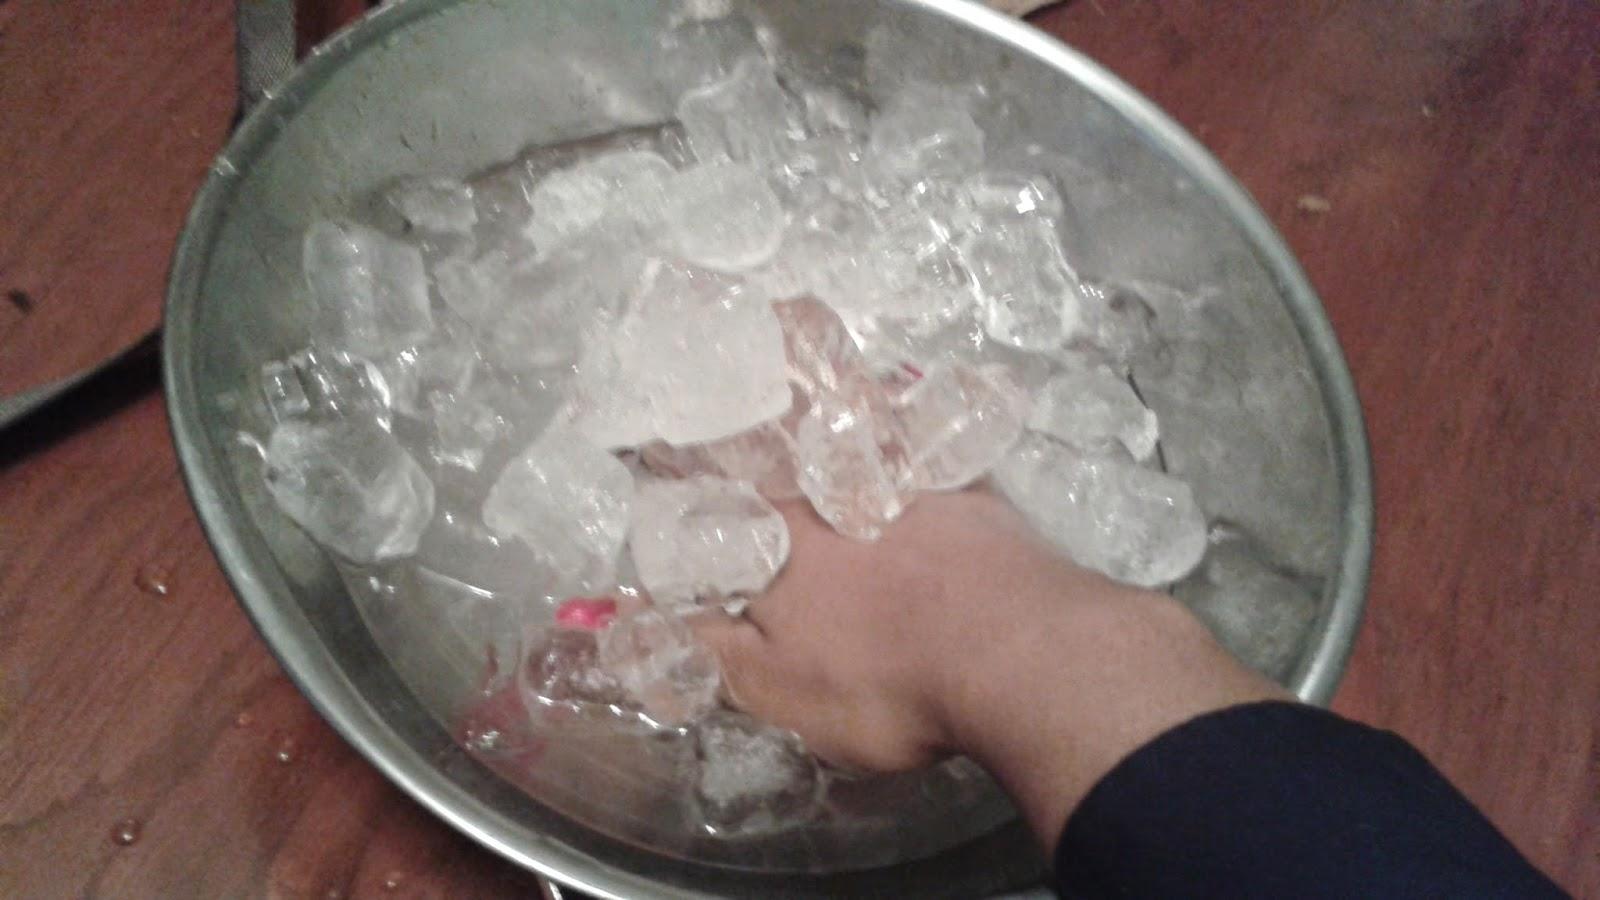 dedo inflado en hielo / inflamed finger put on ice